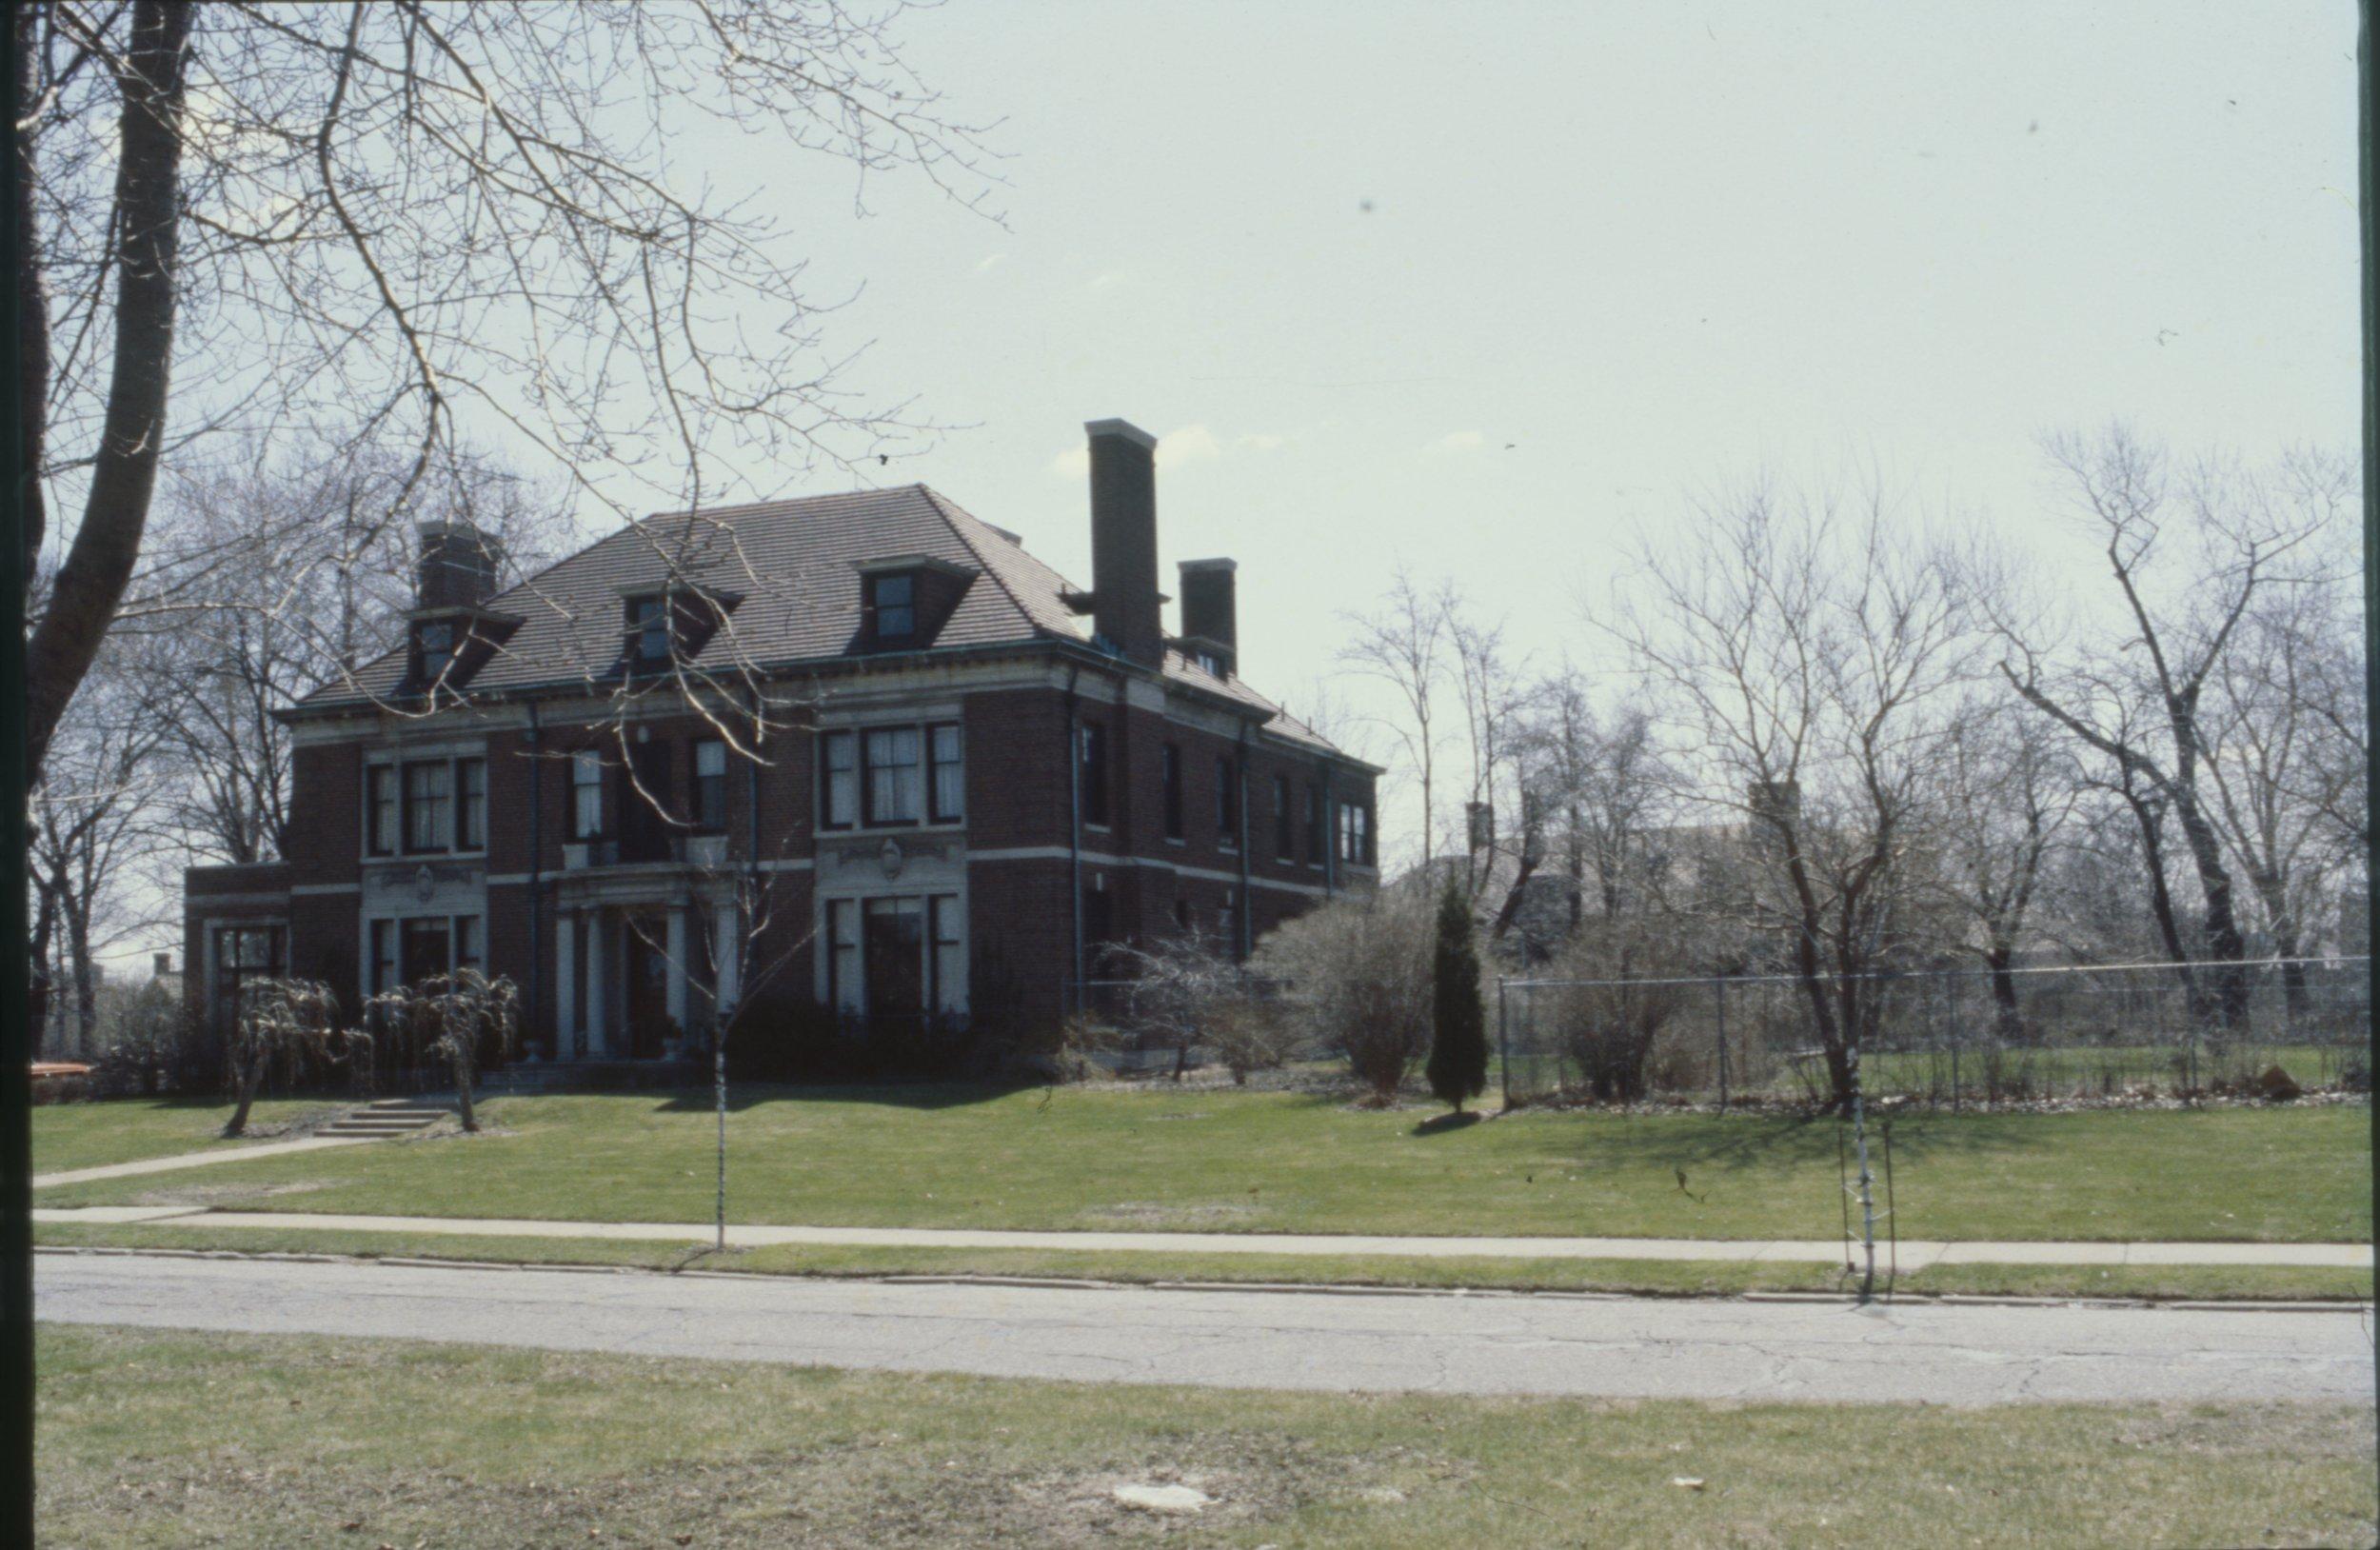 51 W. Boston 1980_4.jpg